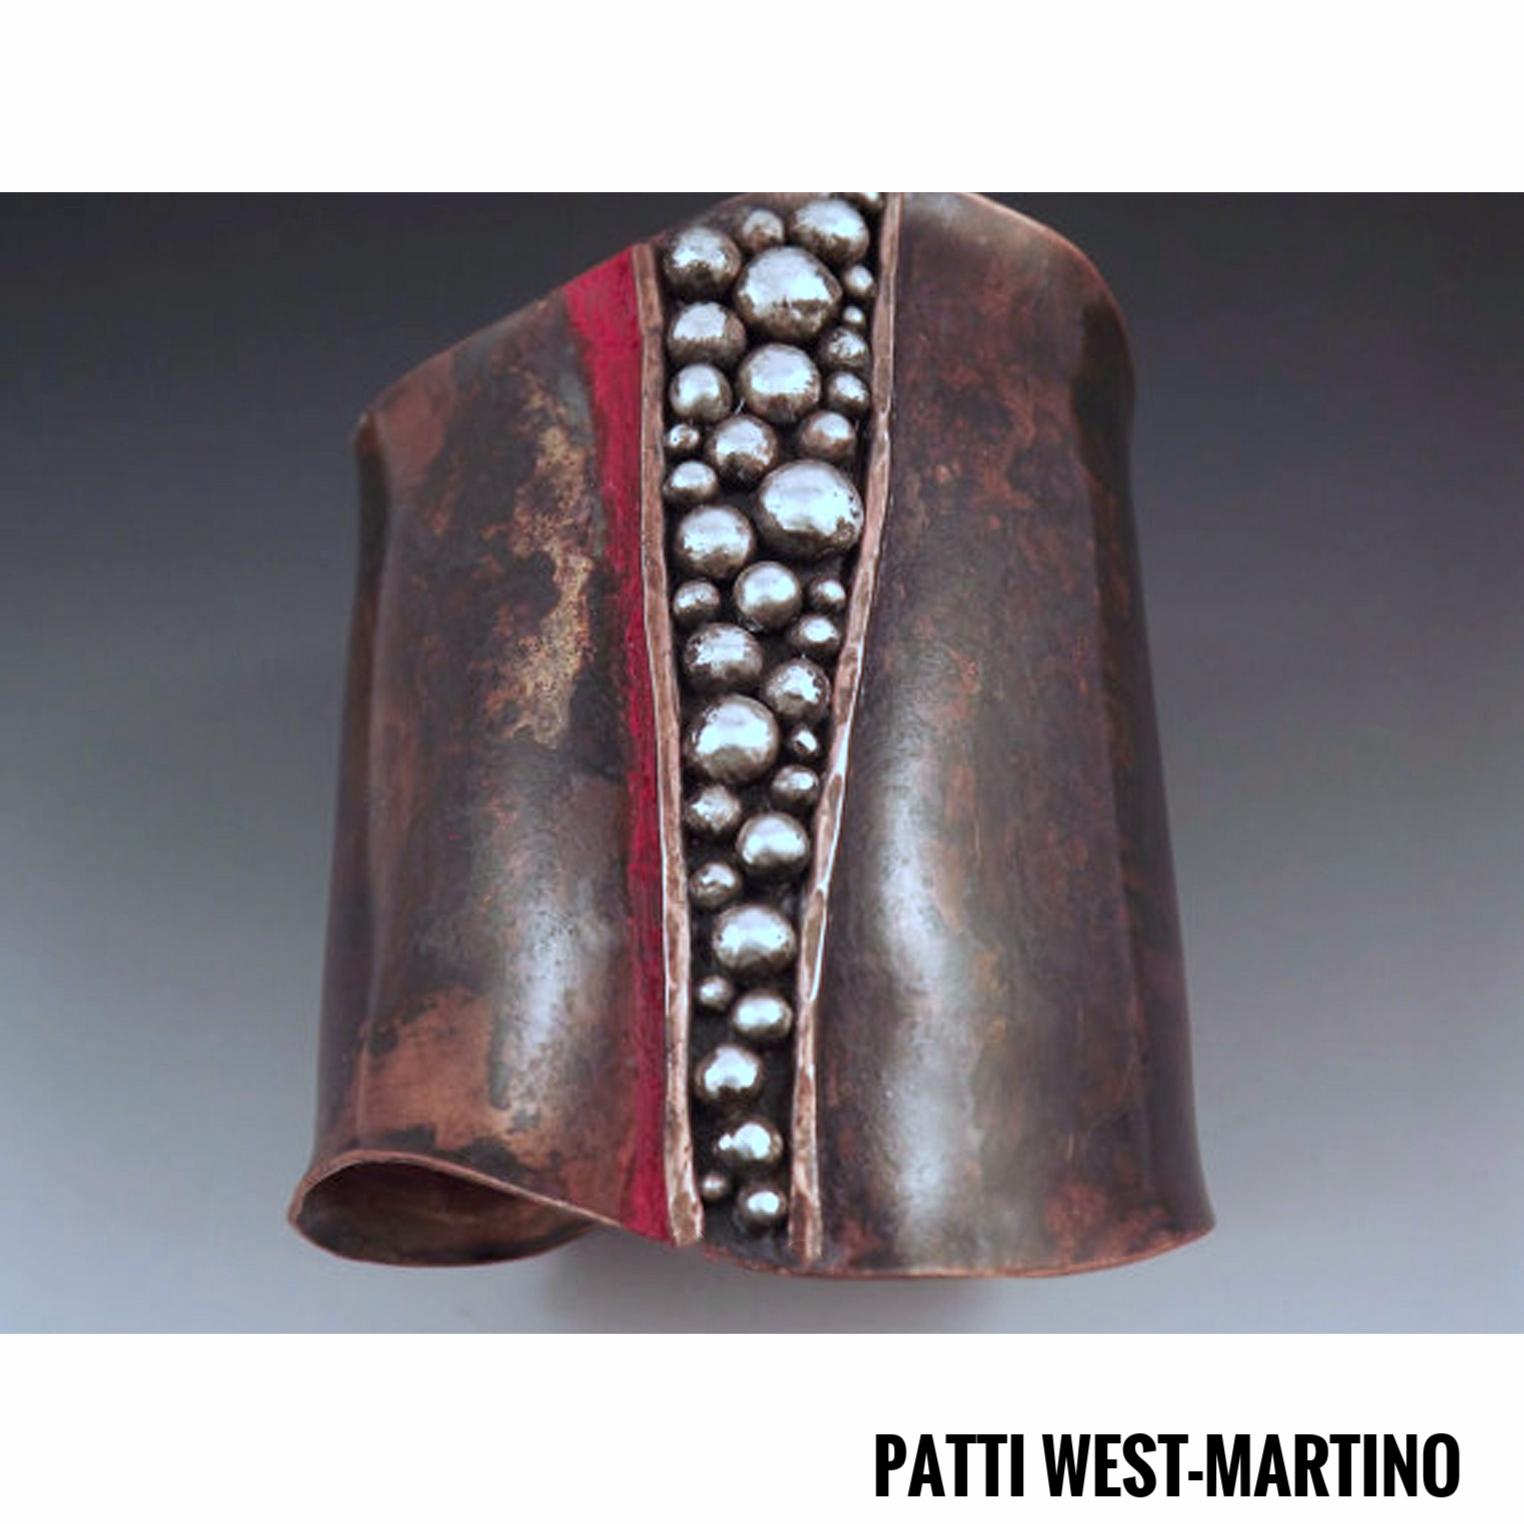 Patti West-Martino